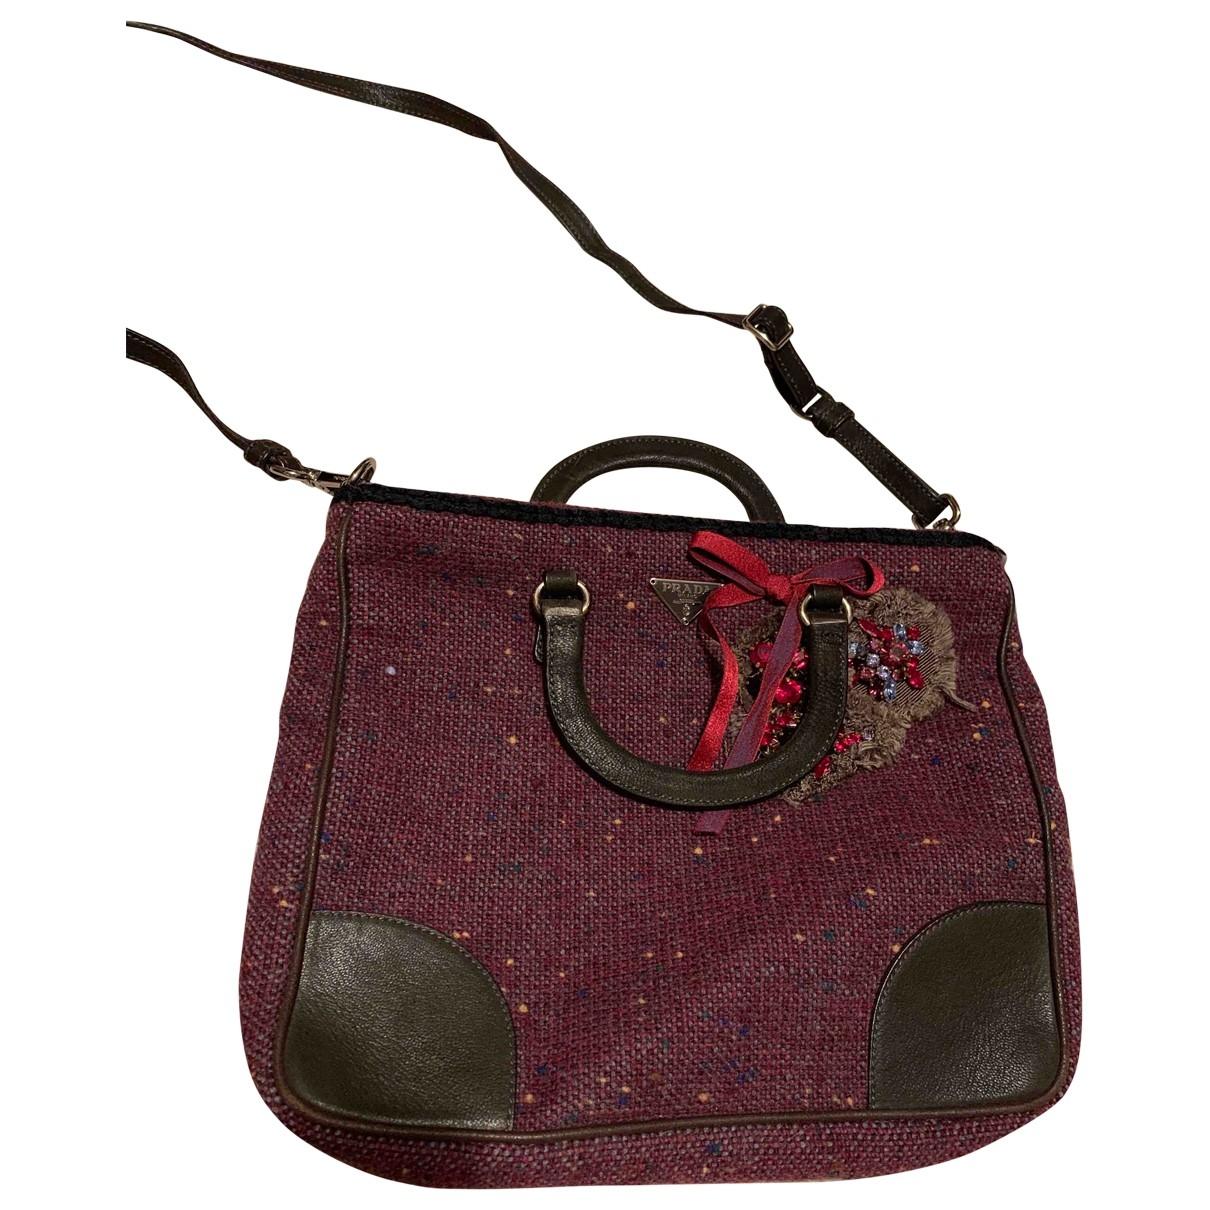 Prada \N Handtasche in  Lila Tweed